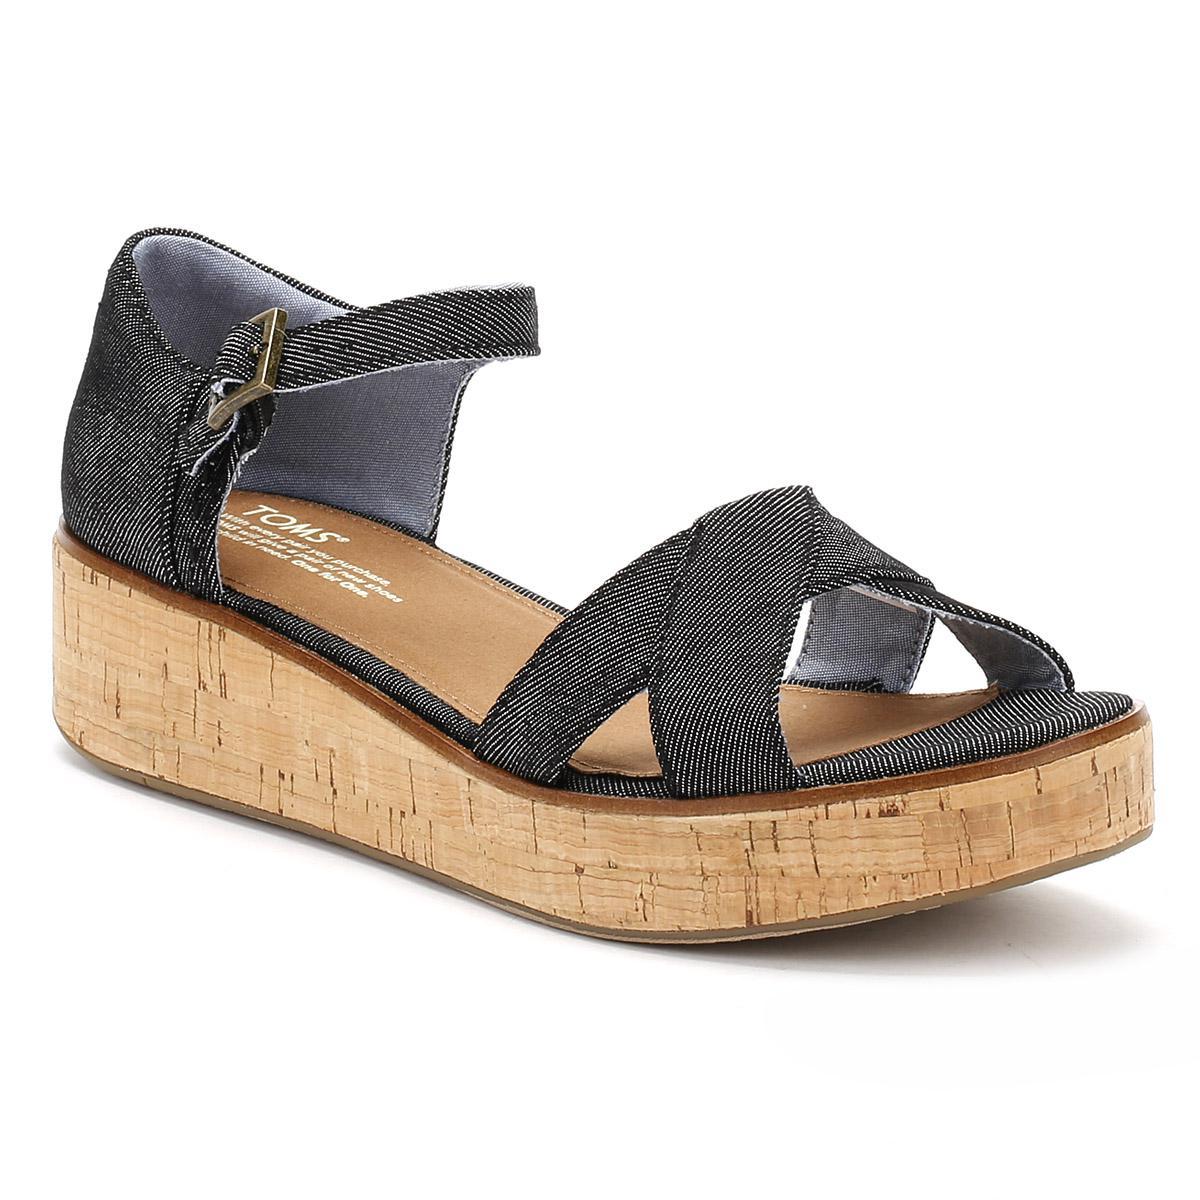 d01c7c63d8df Lyst - TOMS Womens Black Denim Harper Platform Wedge Sandals in Black